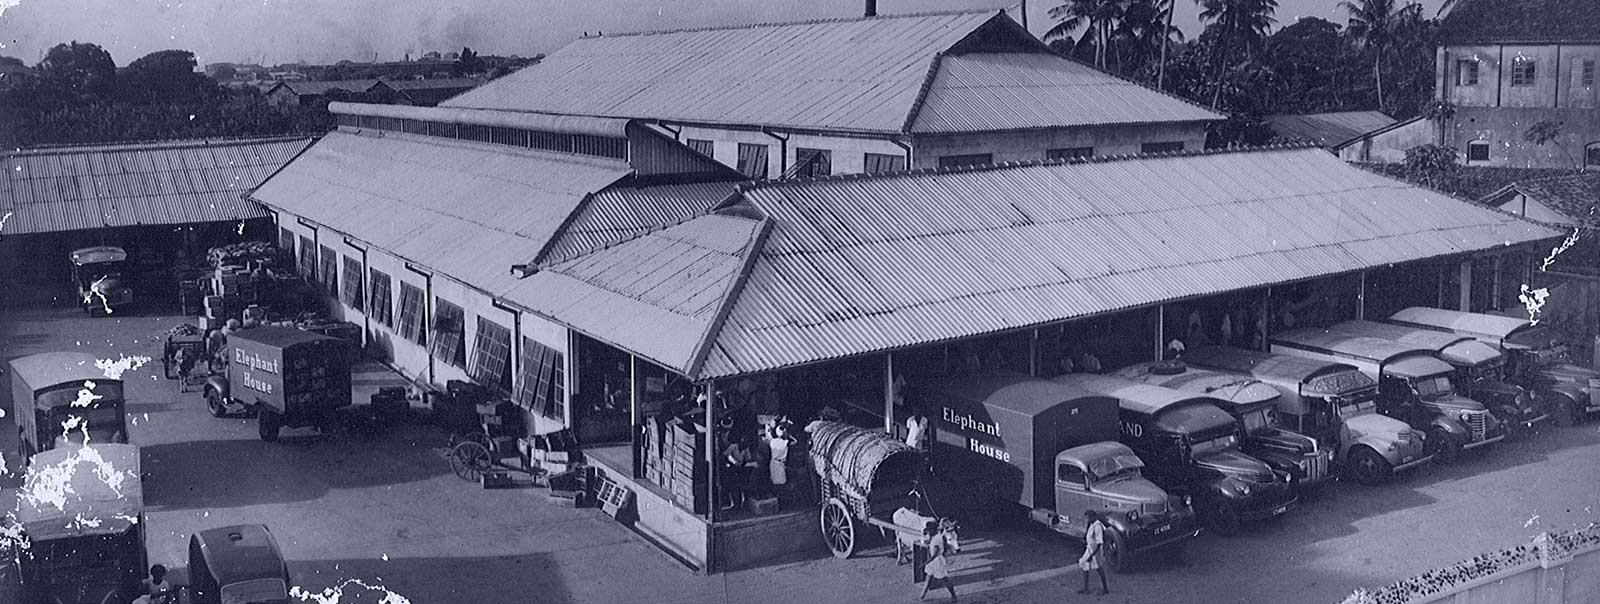 Elephant House History